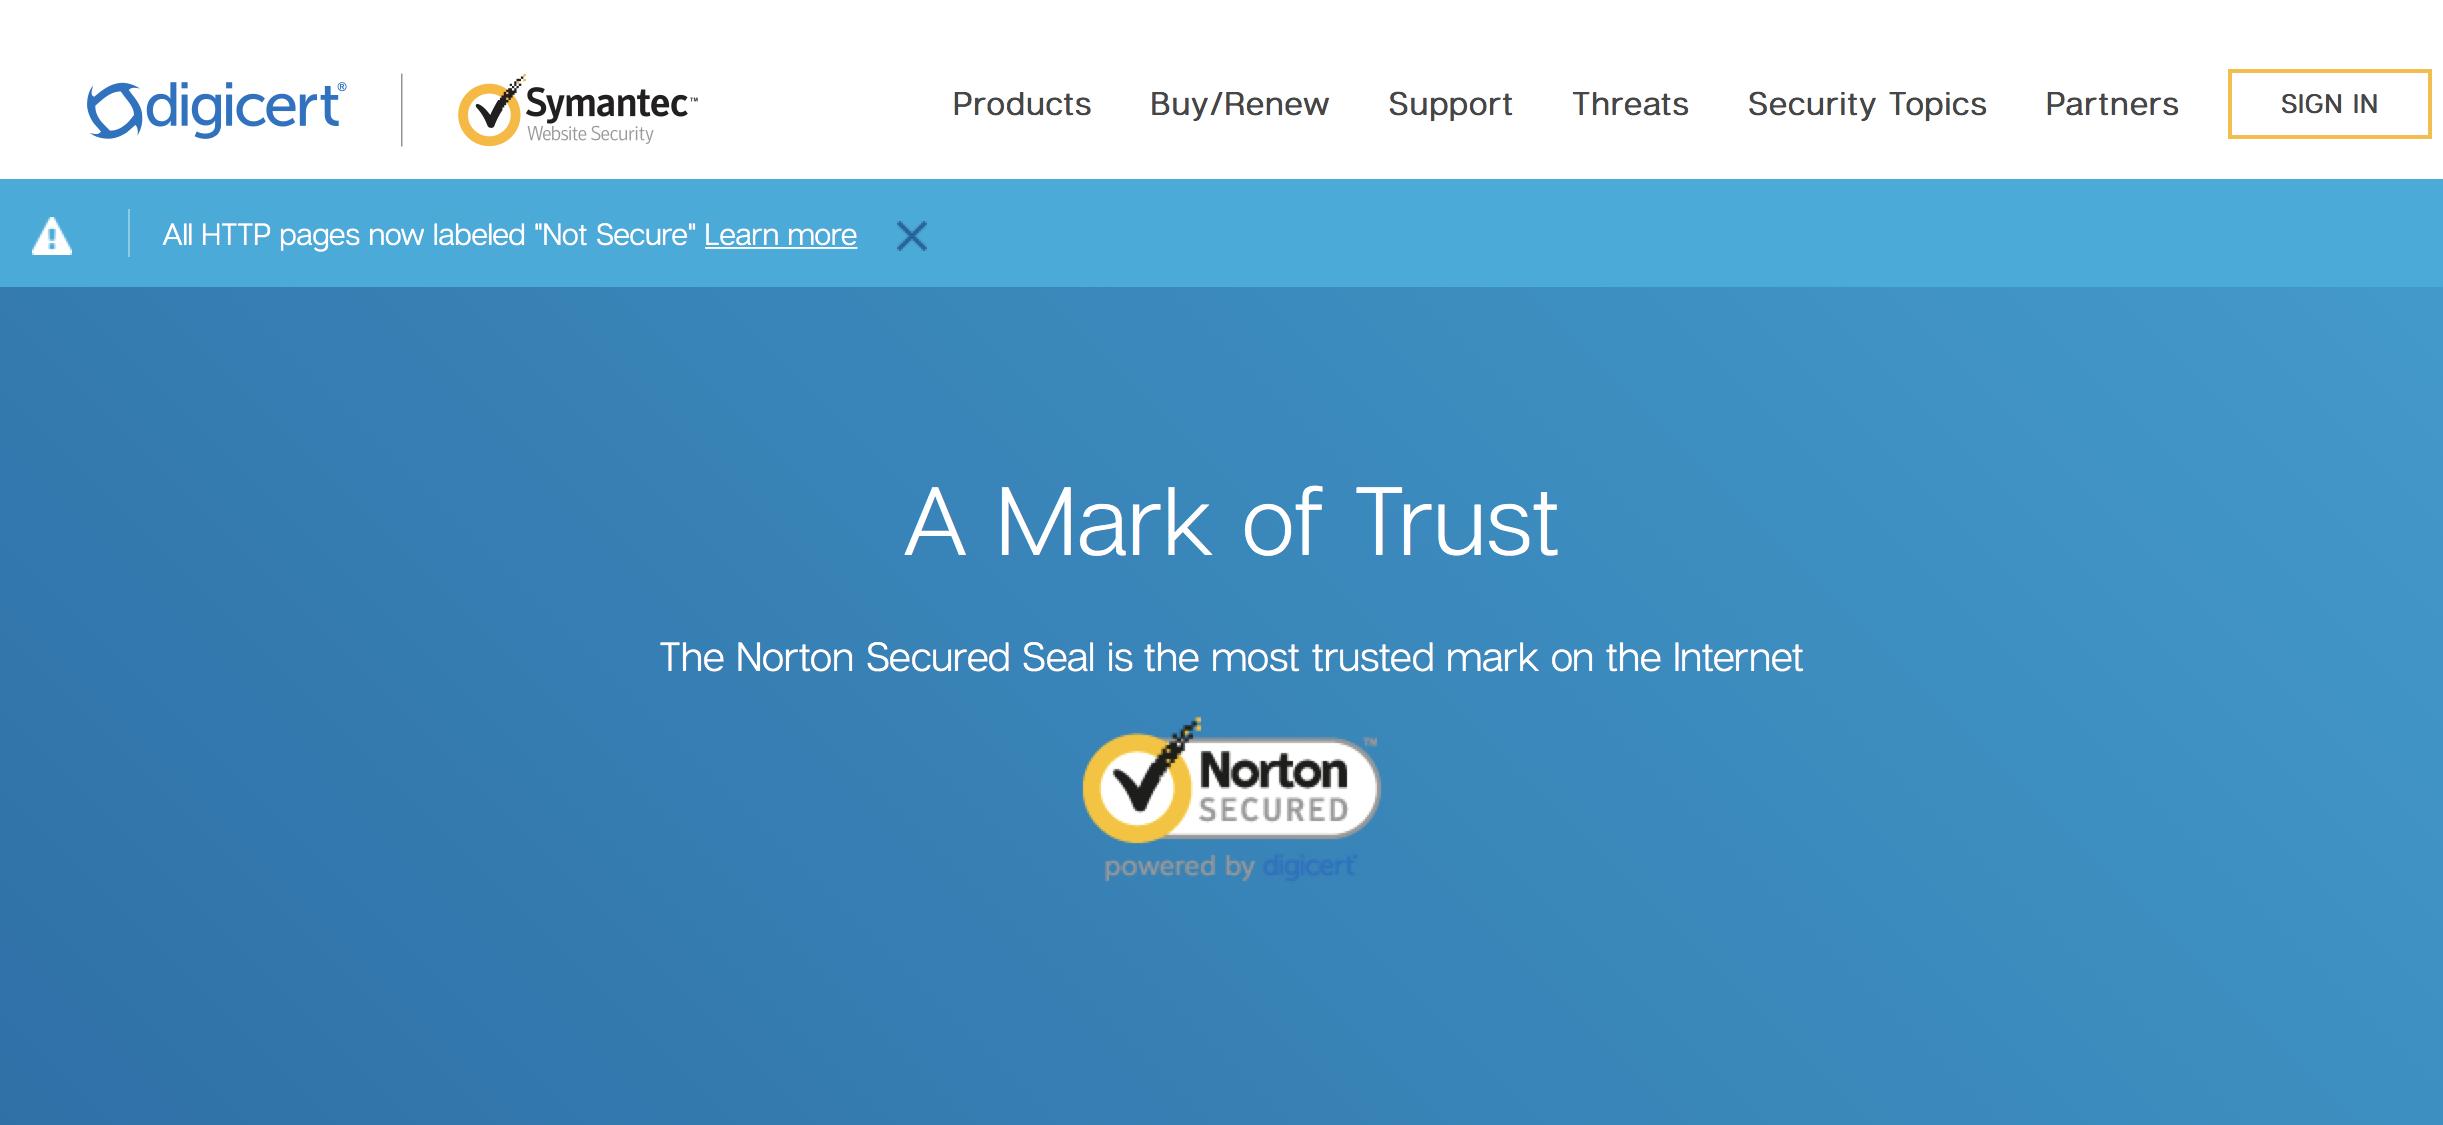 digicert mark of trust